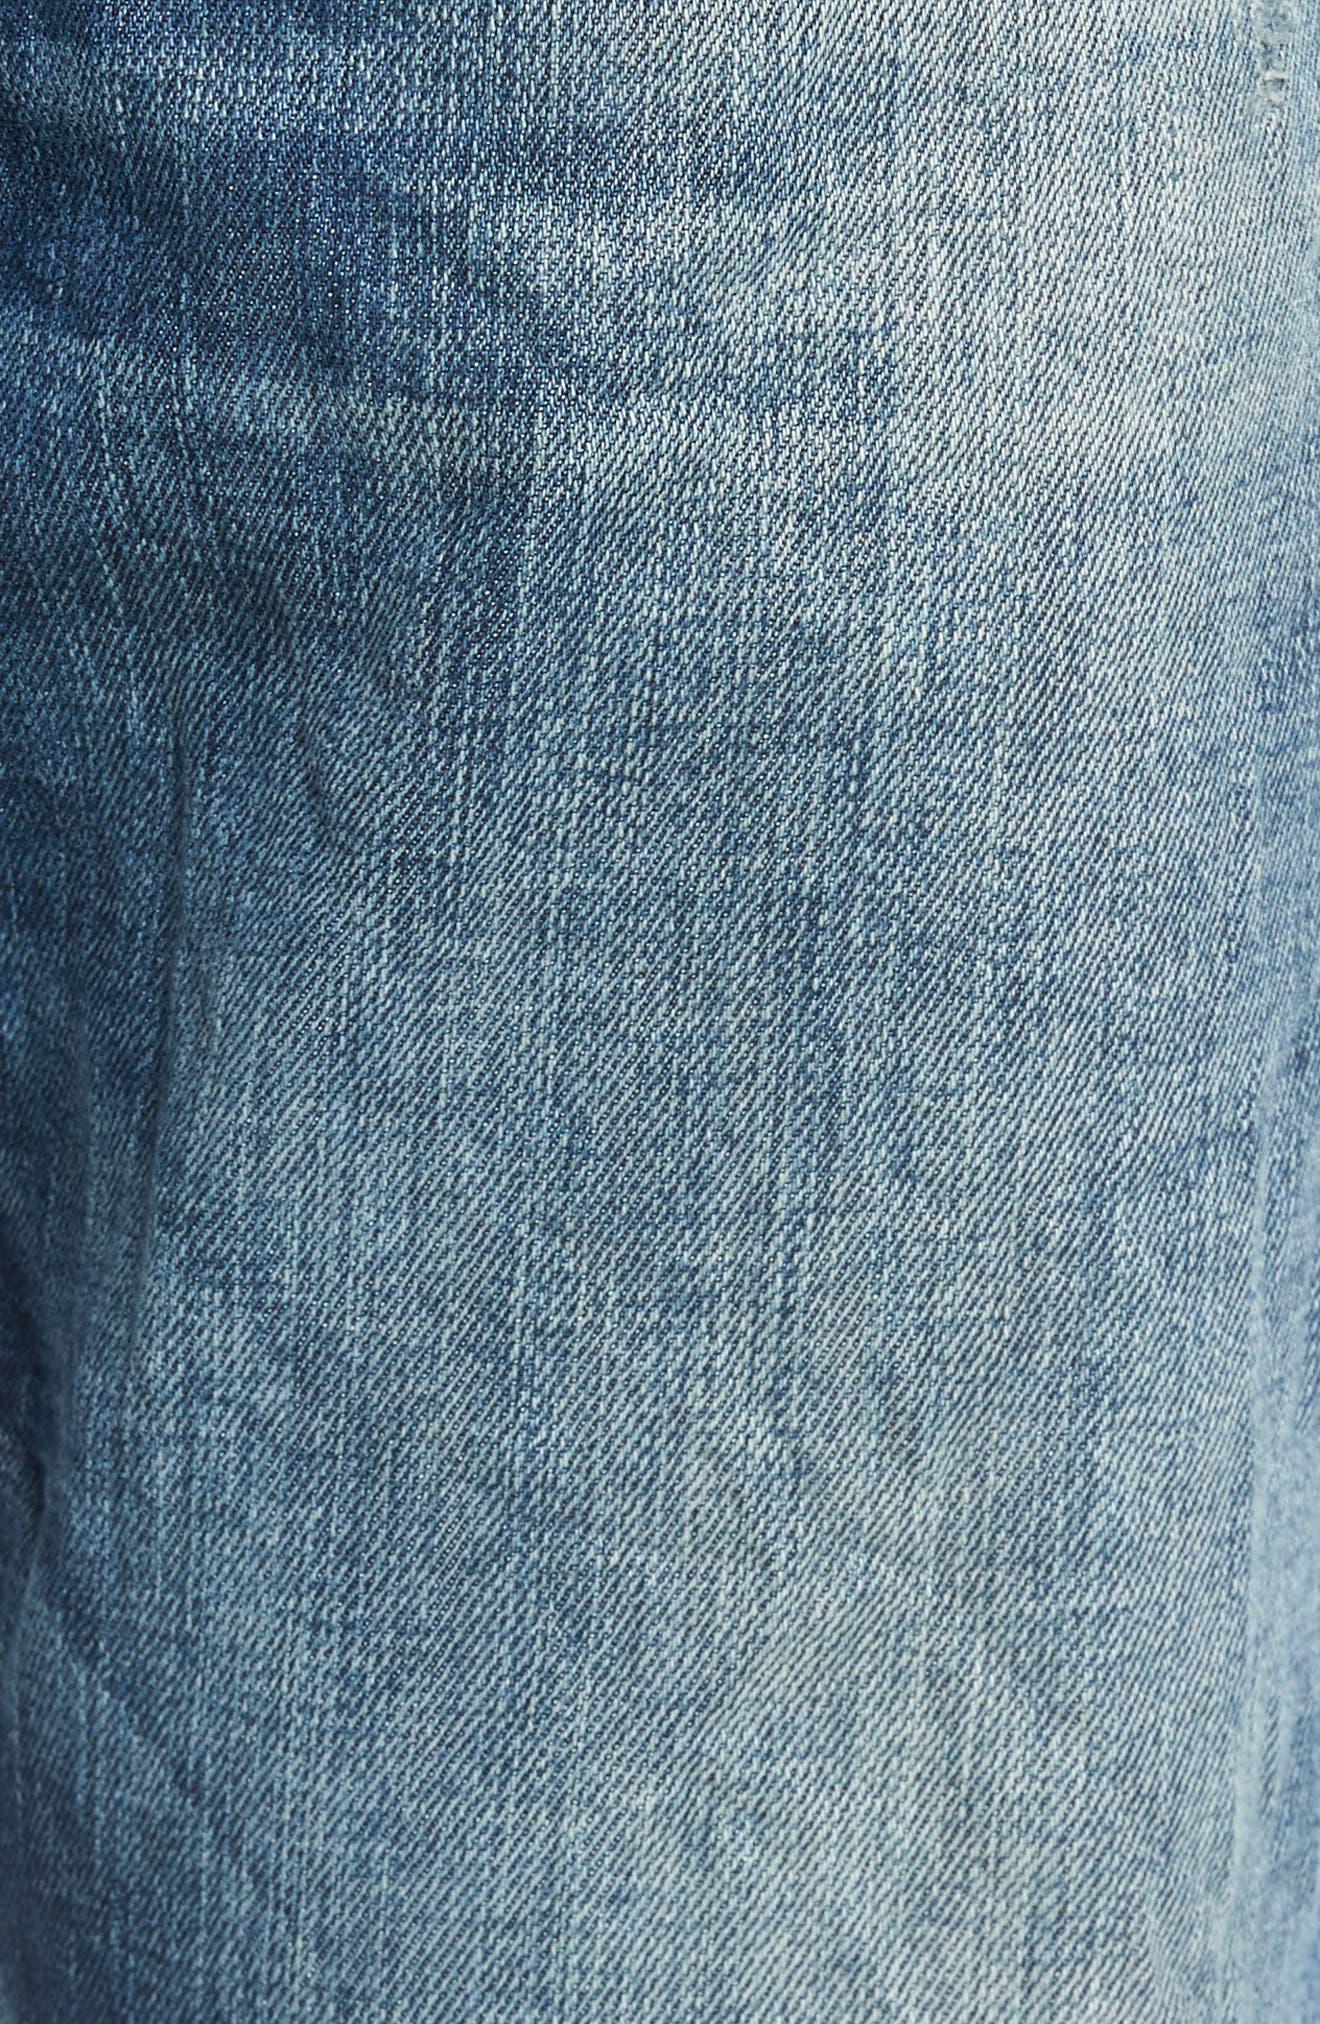 Jake Easy Slim Fit Jeans,                             Alternate thumbnail 5, color,                             420